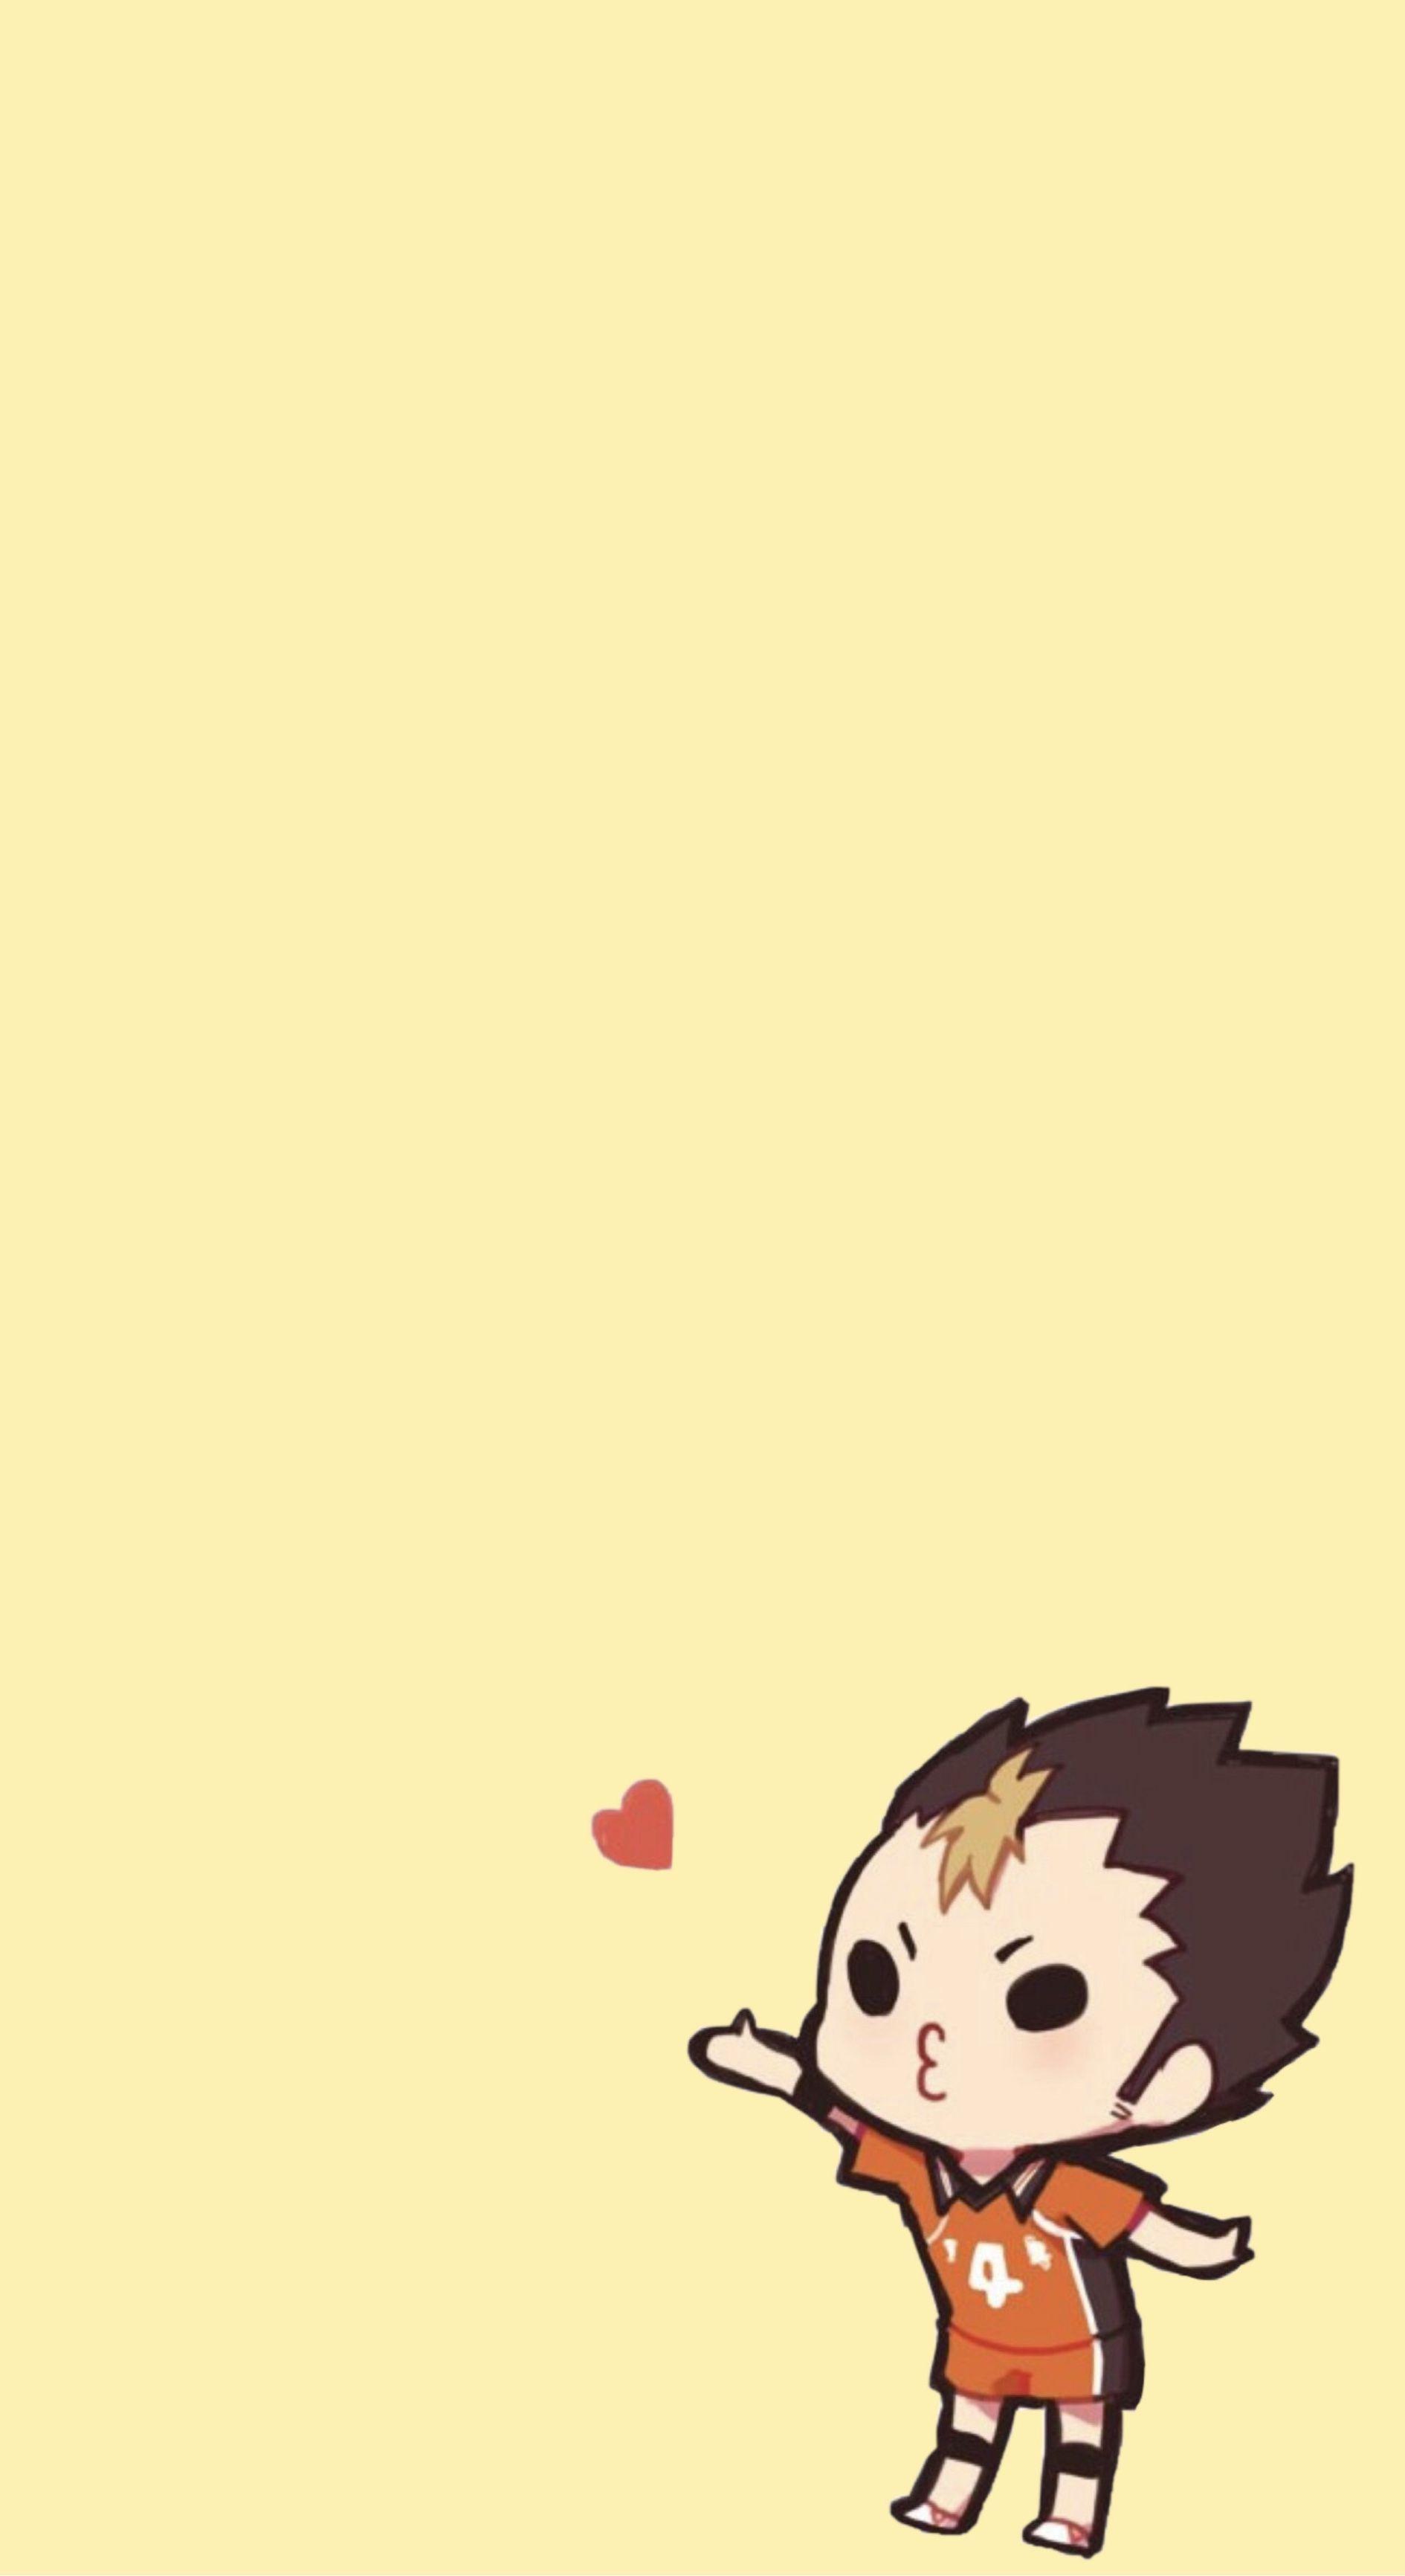 nishinoya wallpaper in 2020   Haikyuu anime, Cute anime ...